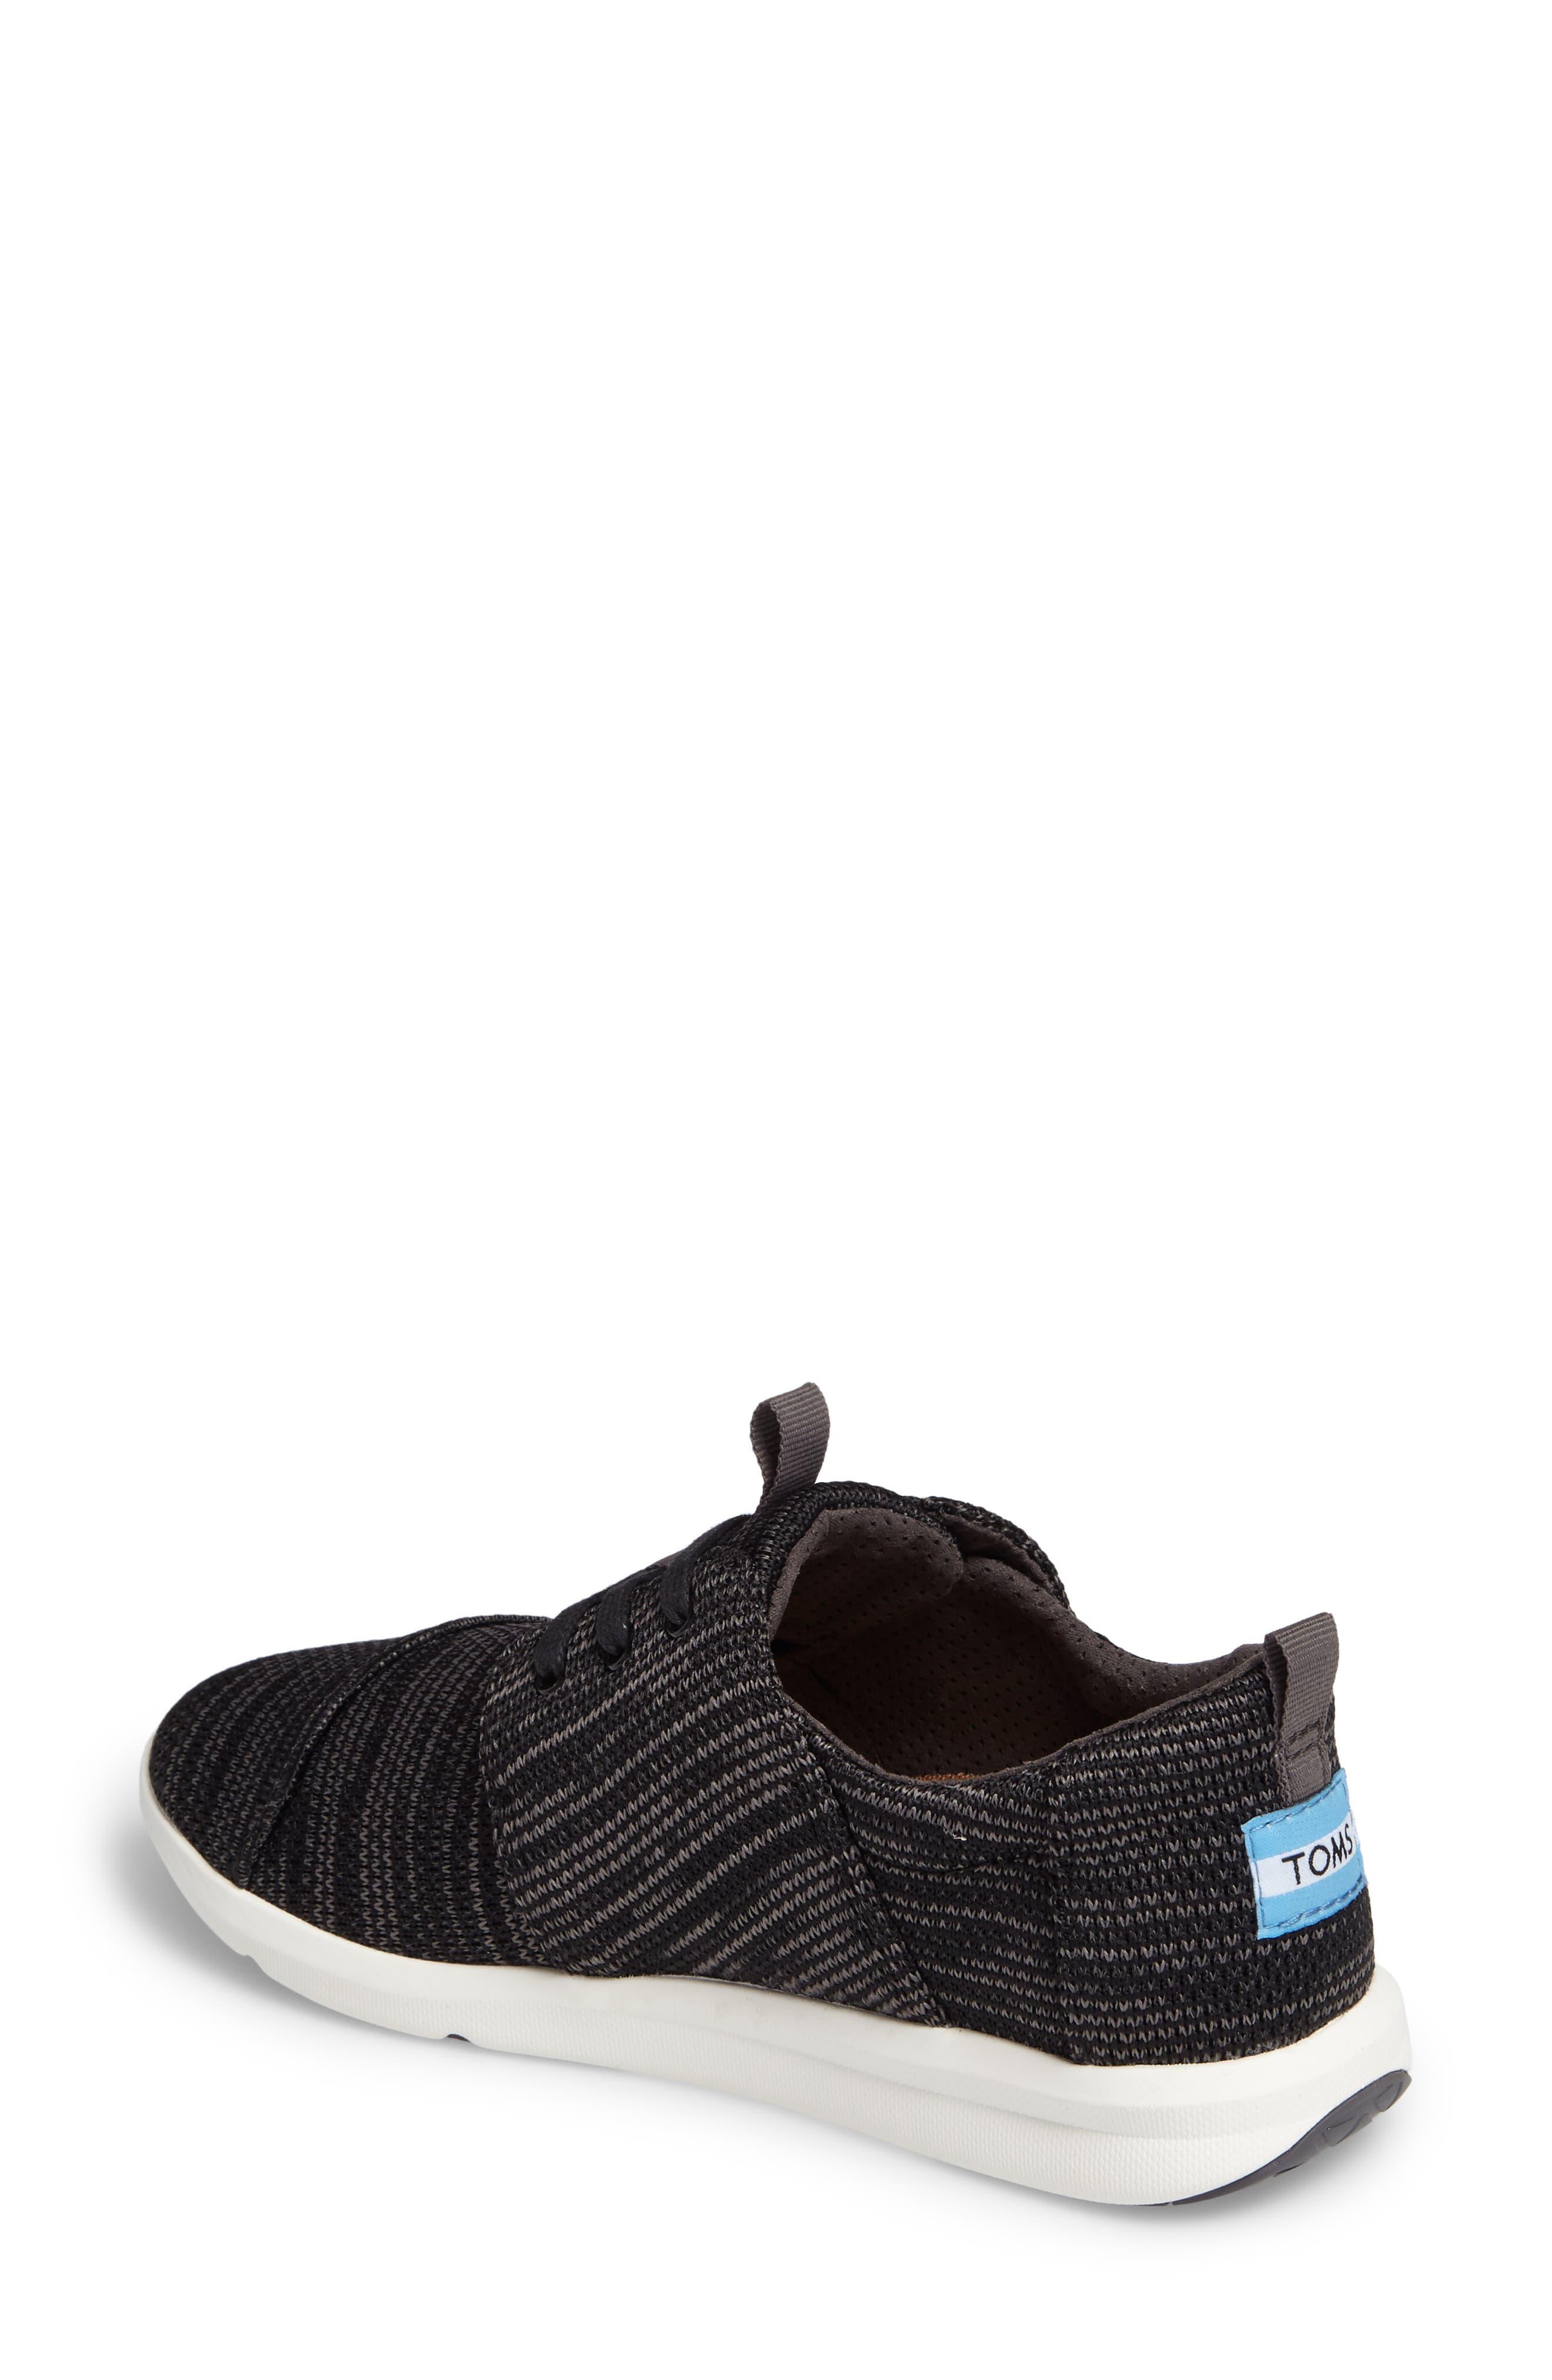 TOMS,                             'Del Ray' Sneaker,                             Alternate thumbnail 2, color,                             001